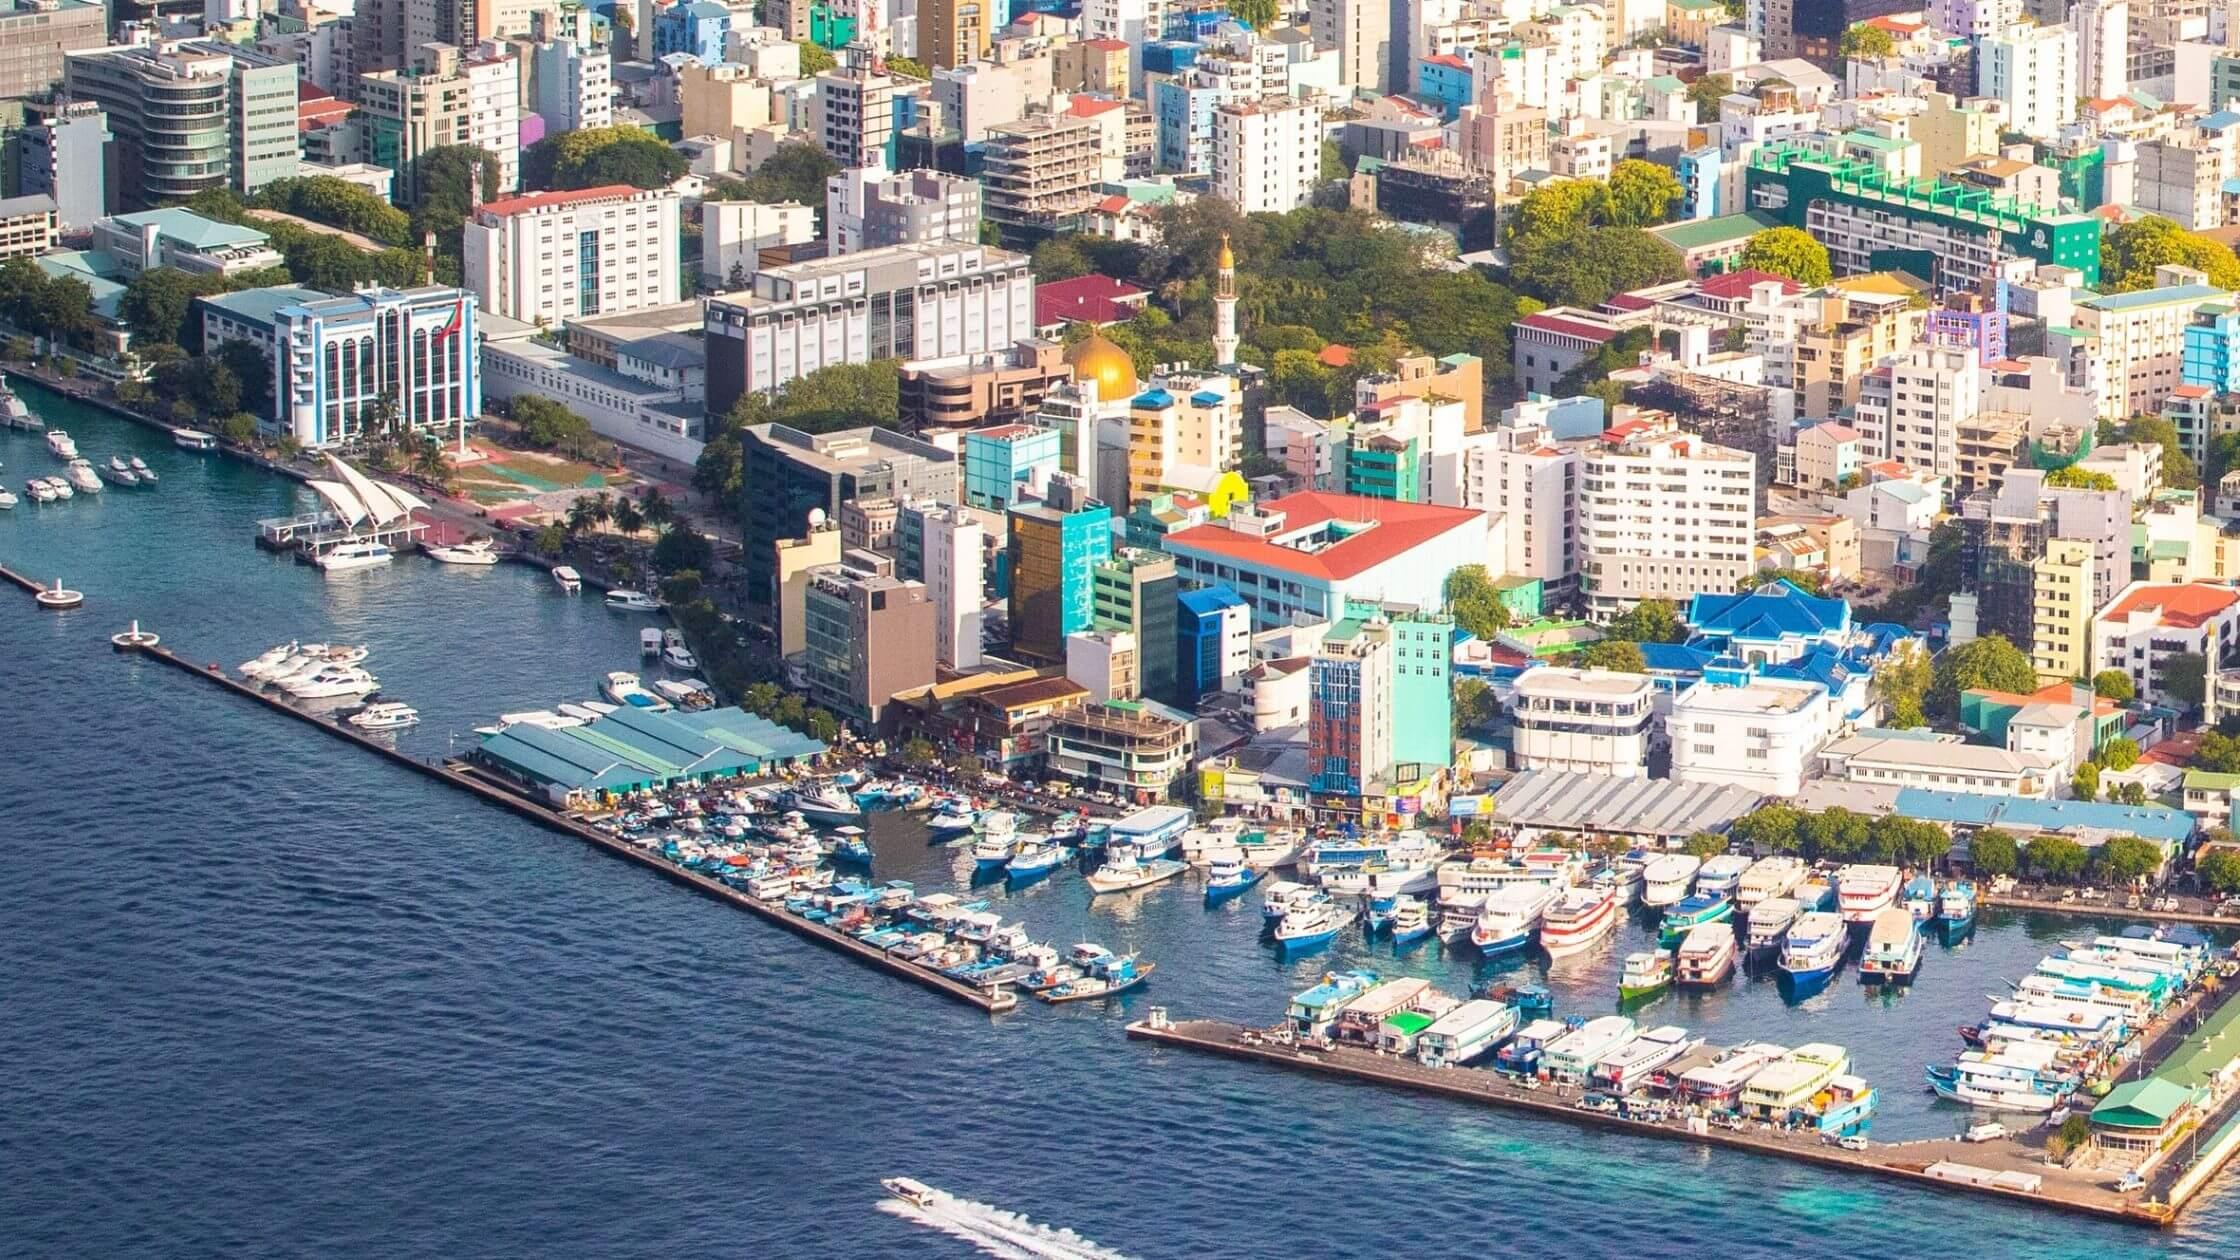 Hotels in Malé, Maldives (Best all-inclusive w/ Price)